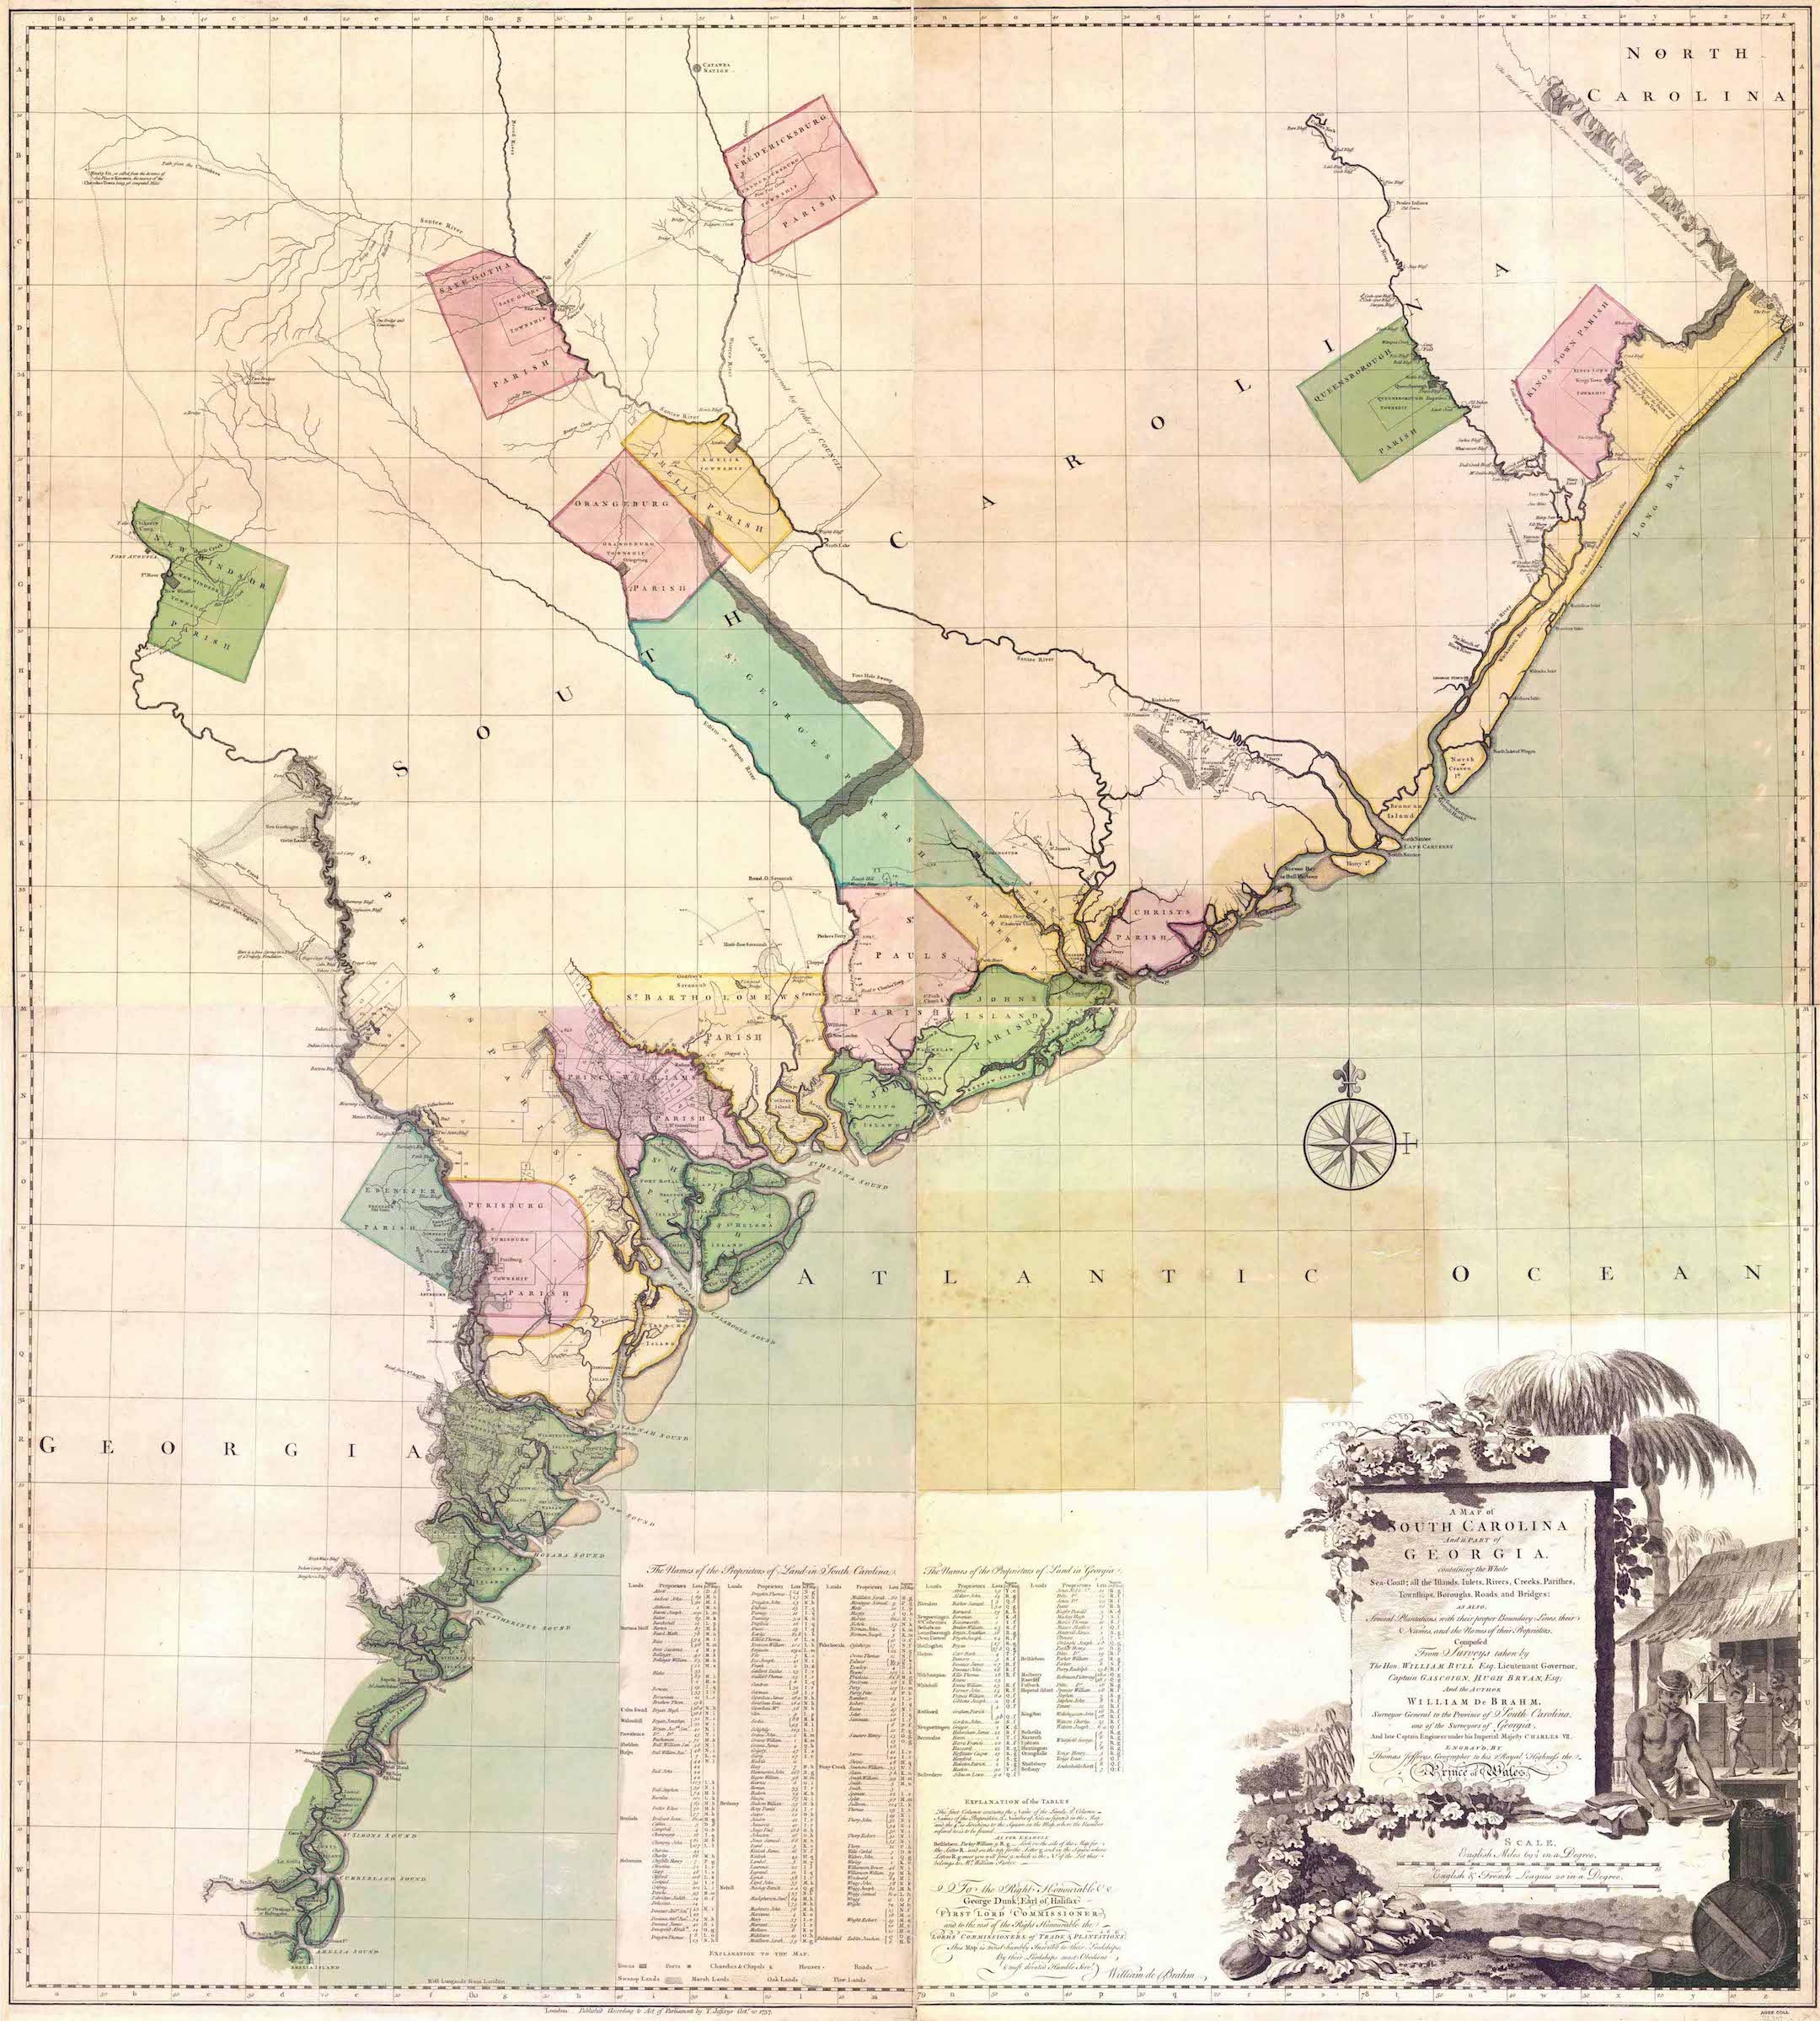 A 1757 map of South Carolina and Georgia by William deBrahm